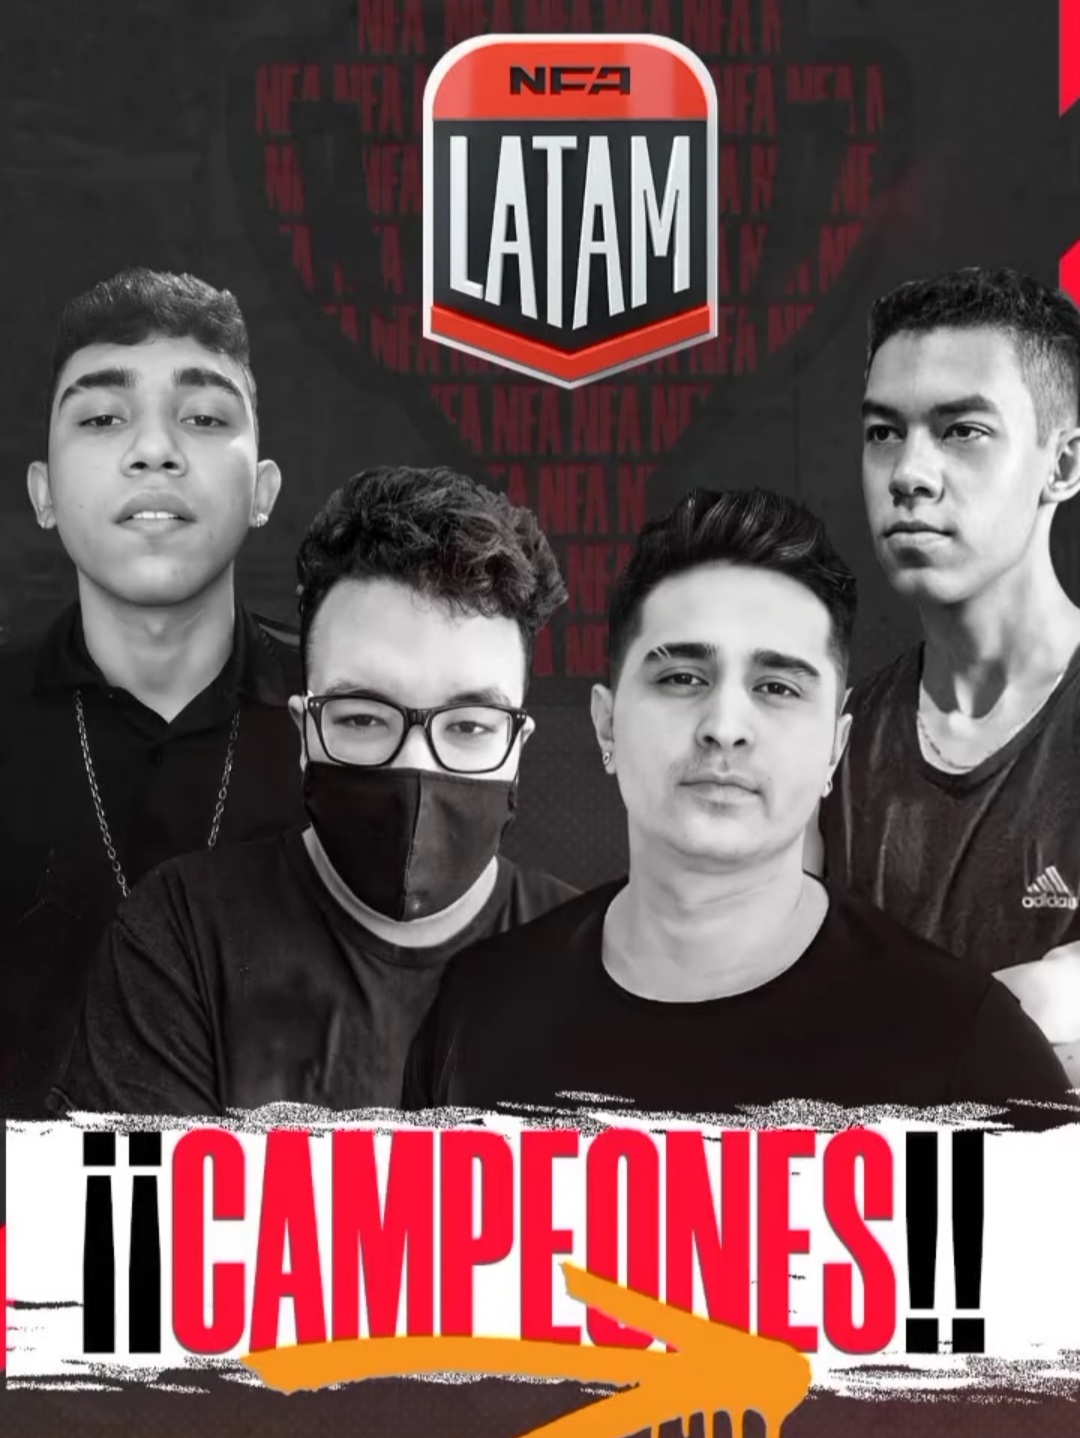 Naguará Campeã NFA Latam 1